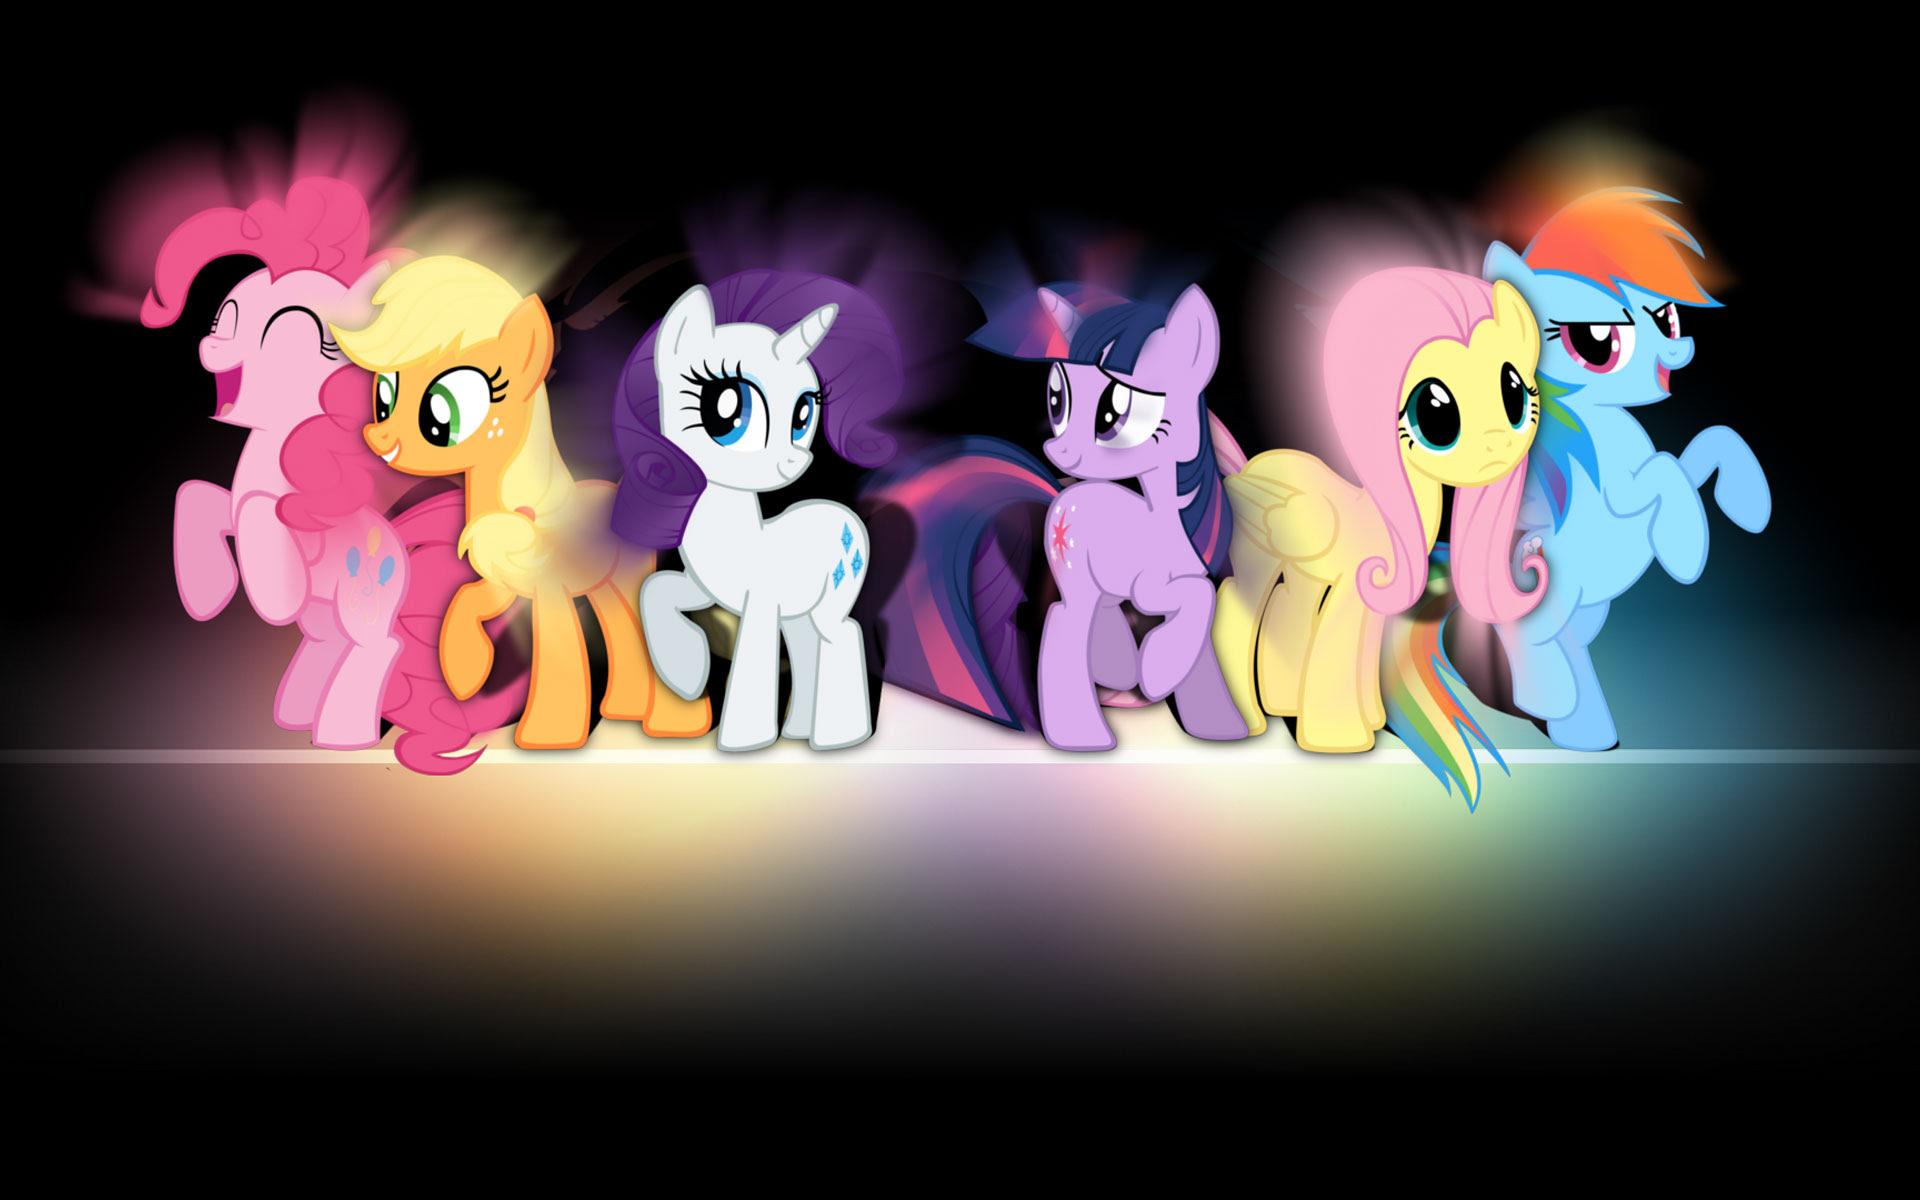 Free My Little Pony Wallpaper 1920x1200 18216